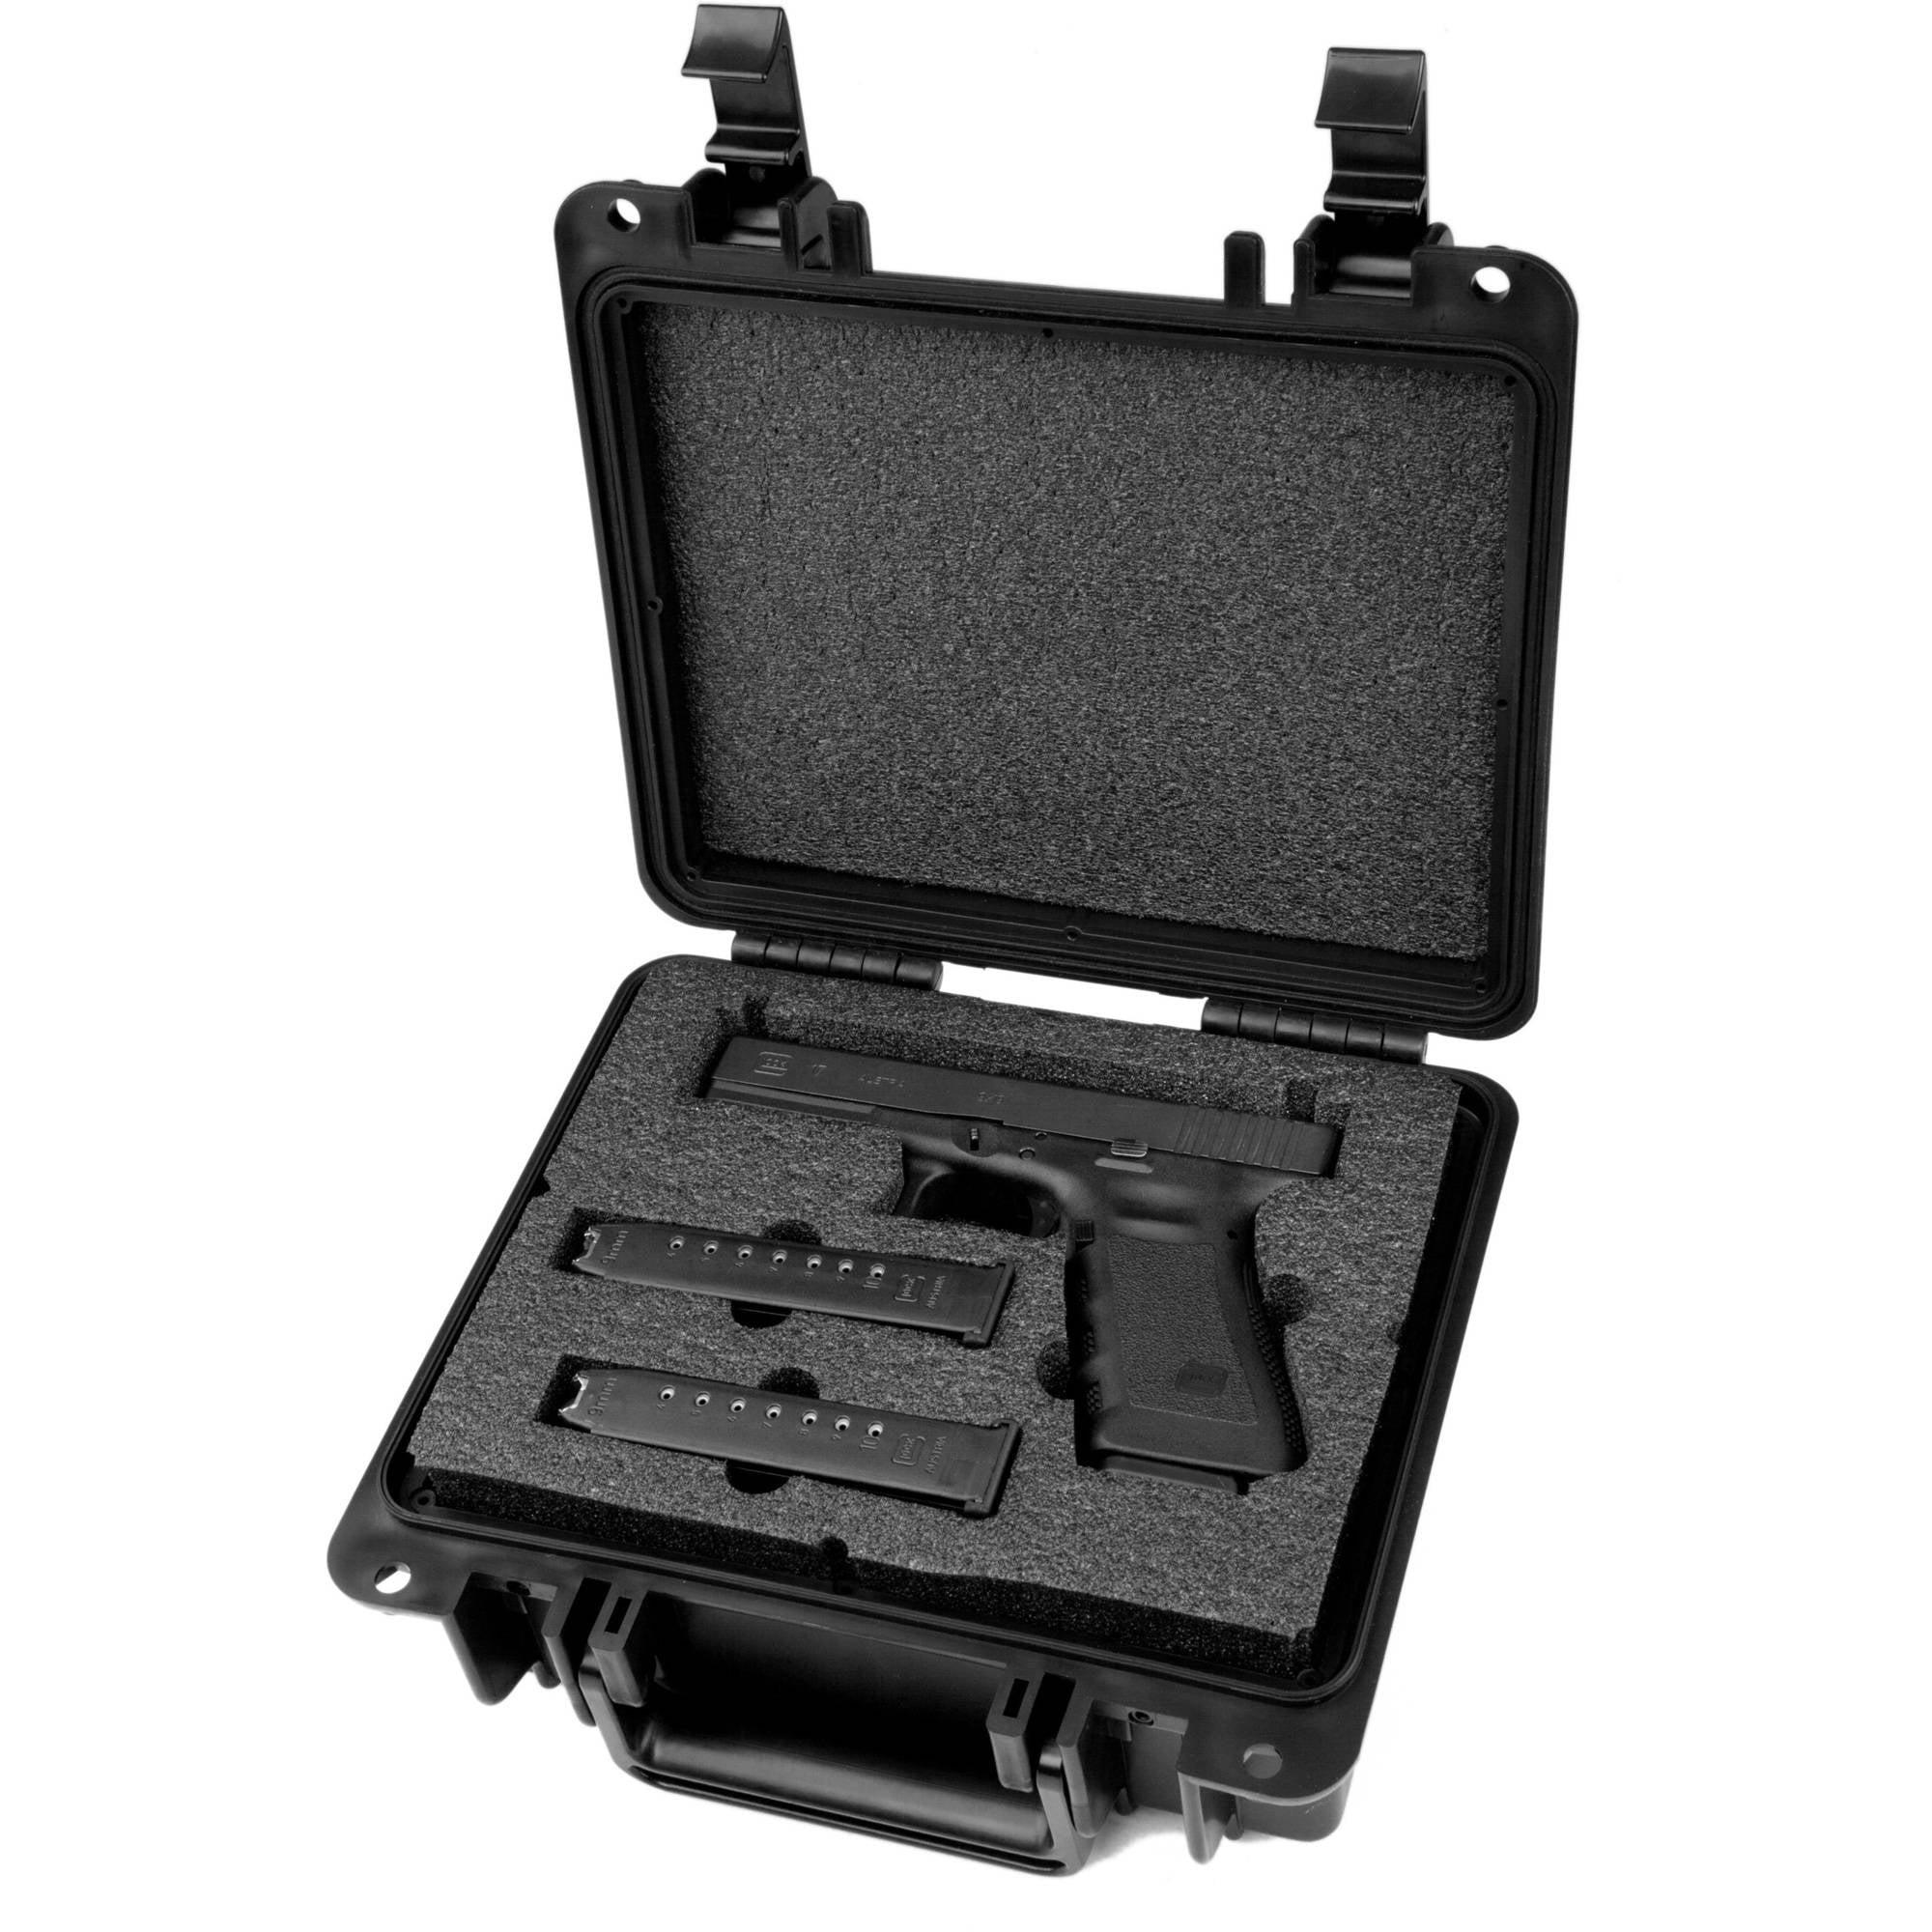 Quick Fire Glock 19, 23, 25, 32, 38 Pistol Case, QF300-G02